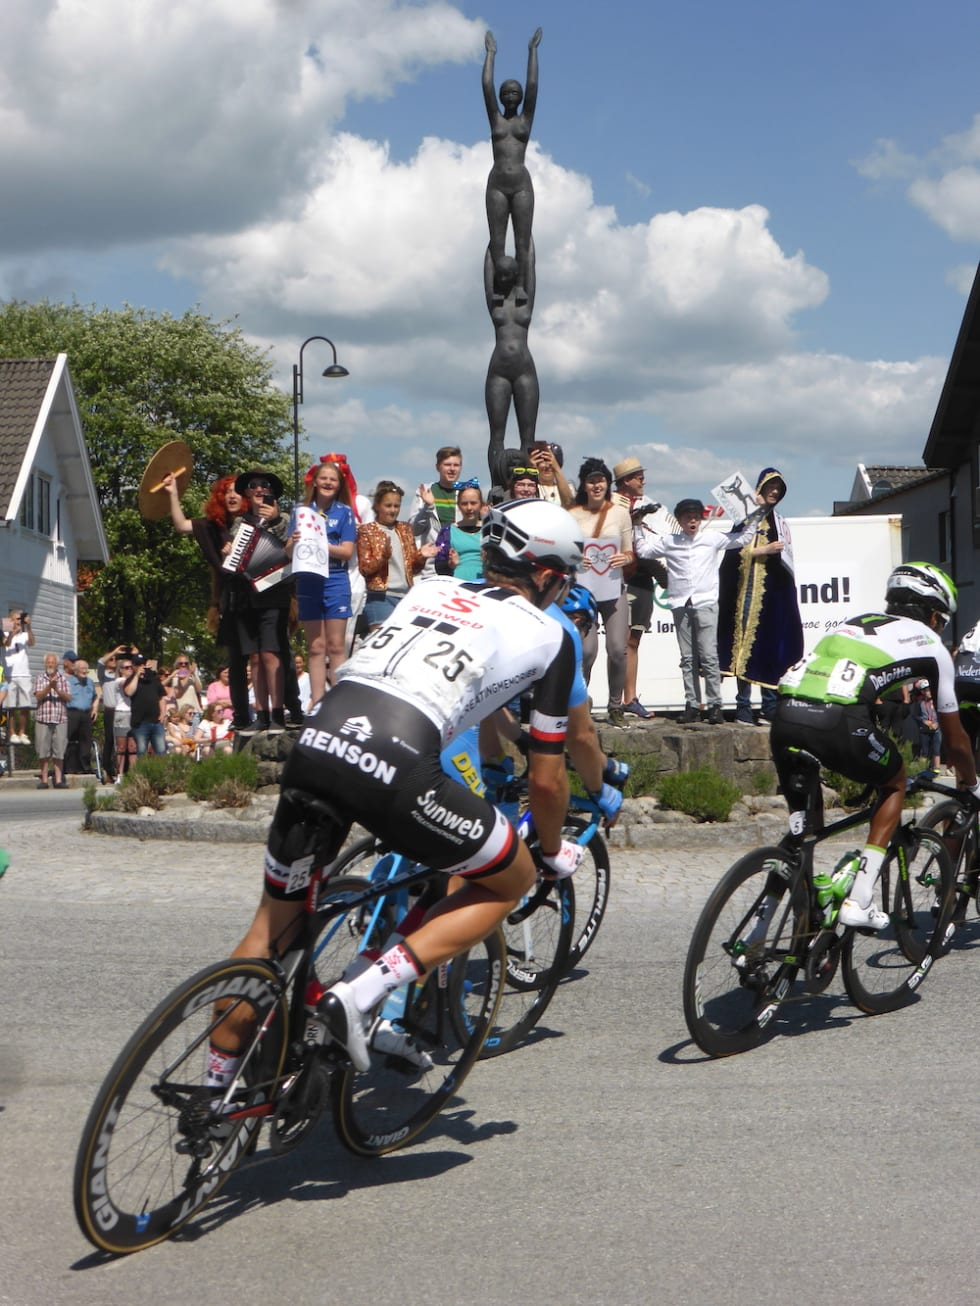 Riders 1 - Foto Geir Stian Ulstein 1000x